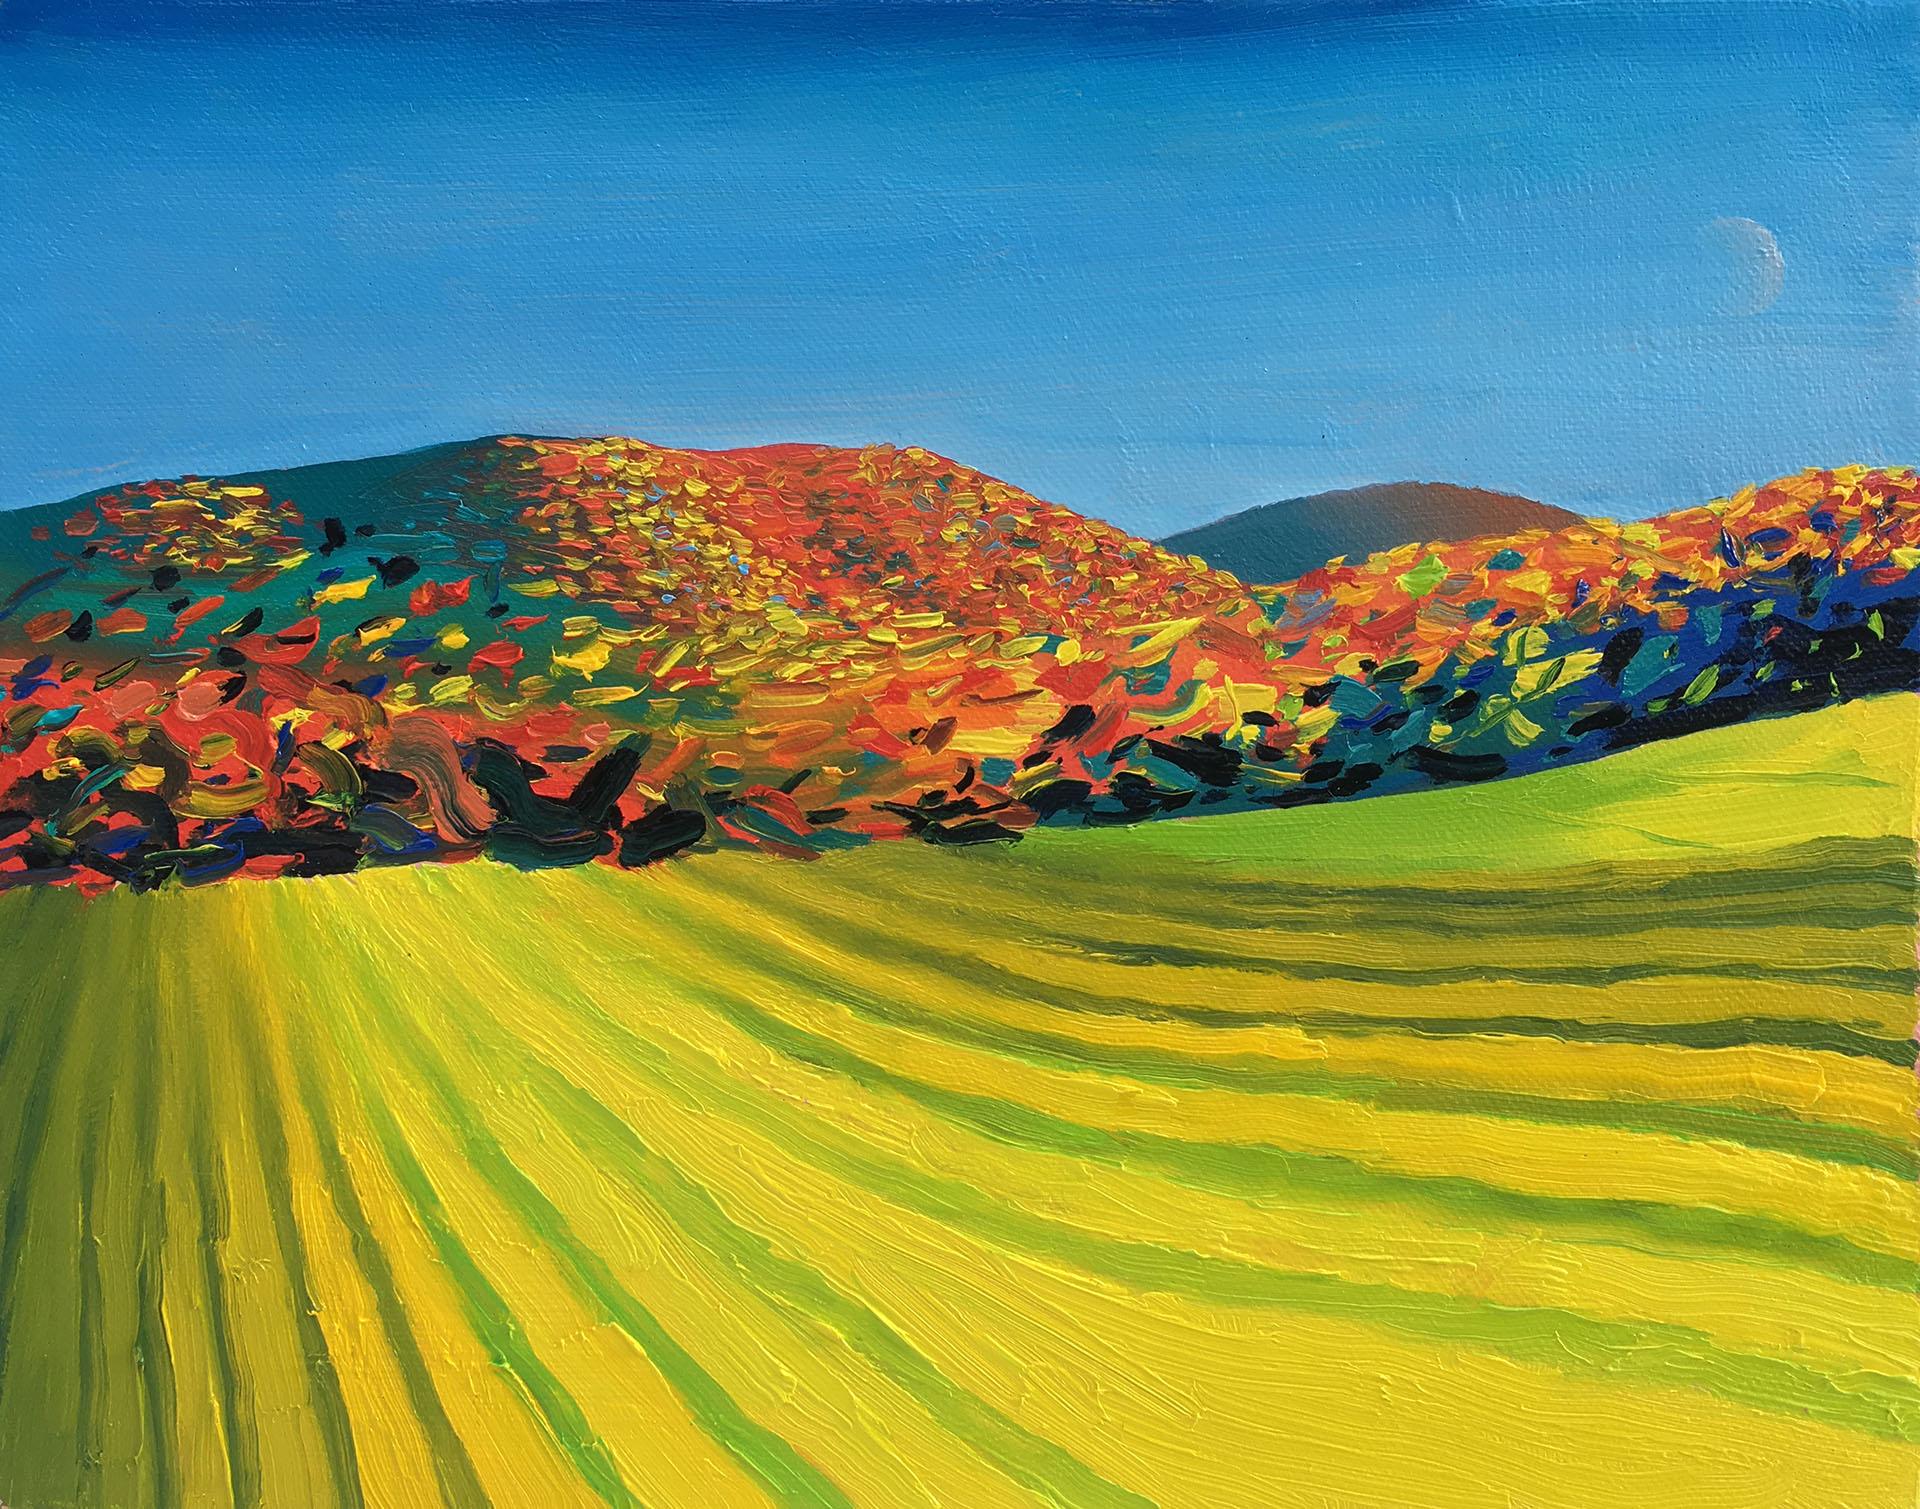 Subtle Moon En Plein Air , 2016 Oil on canvas 8 x 10 inches ELSW-0026 $2,500